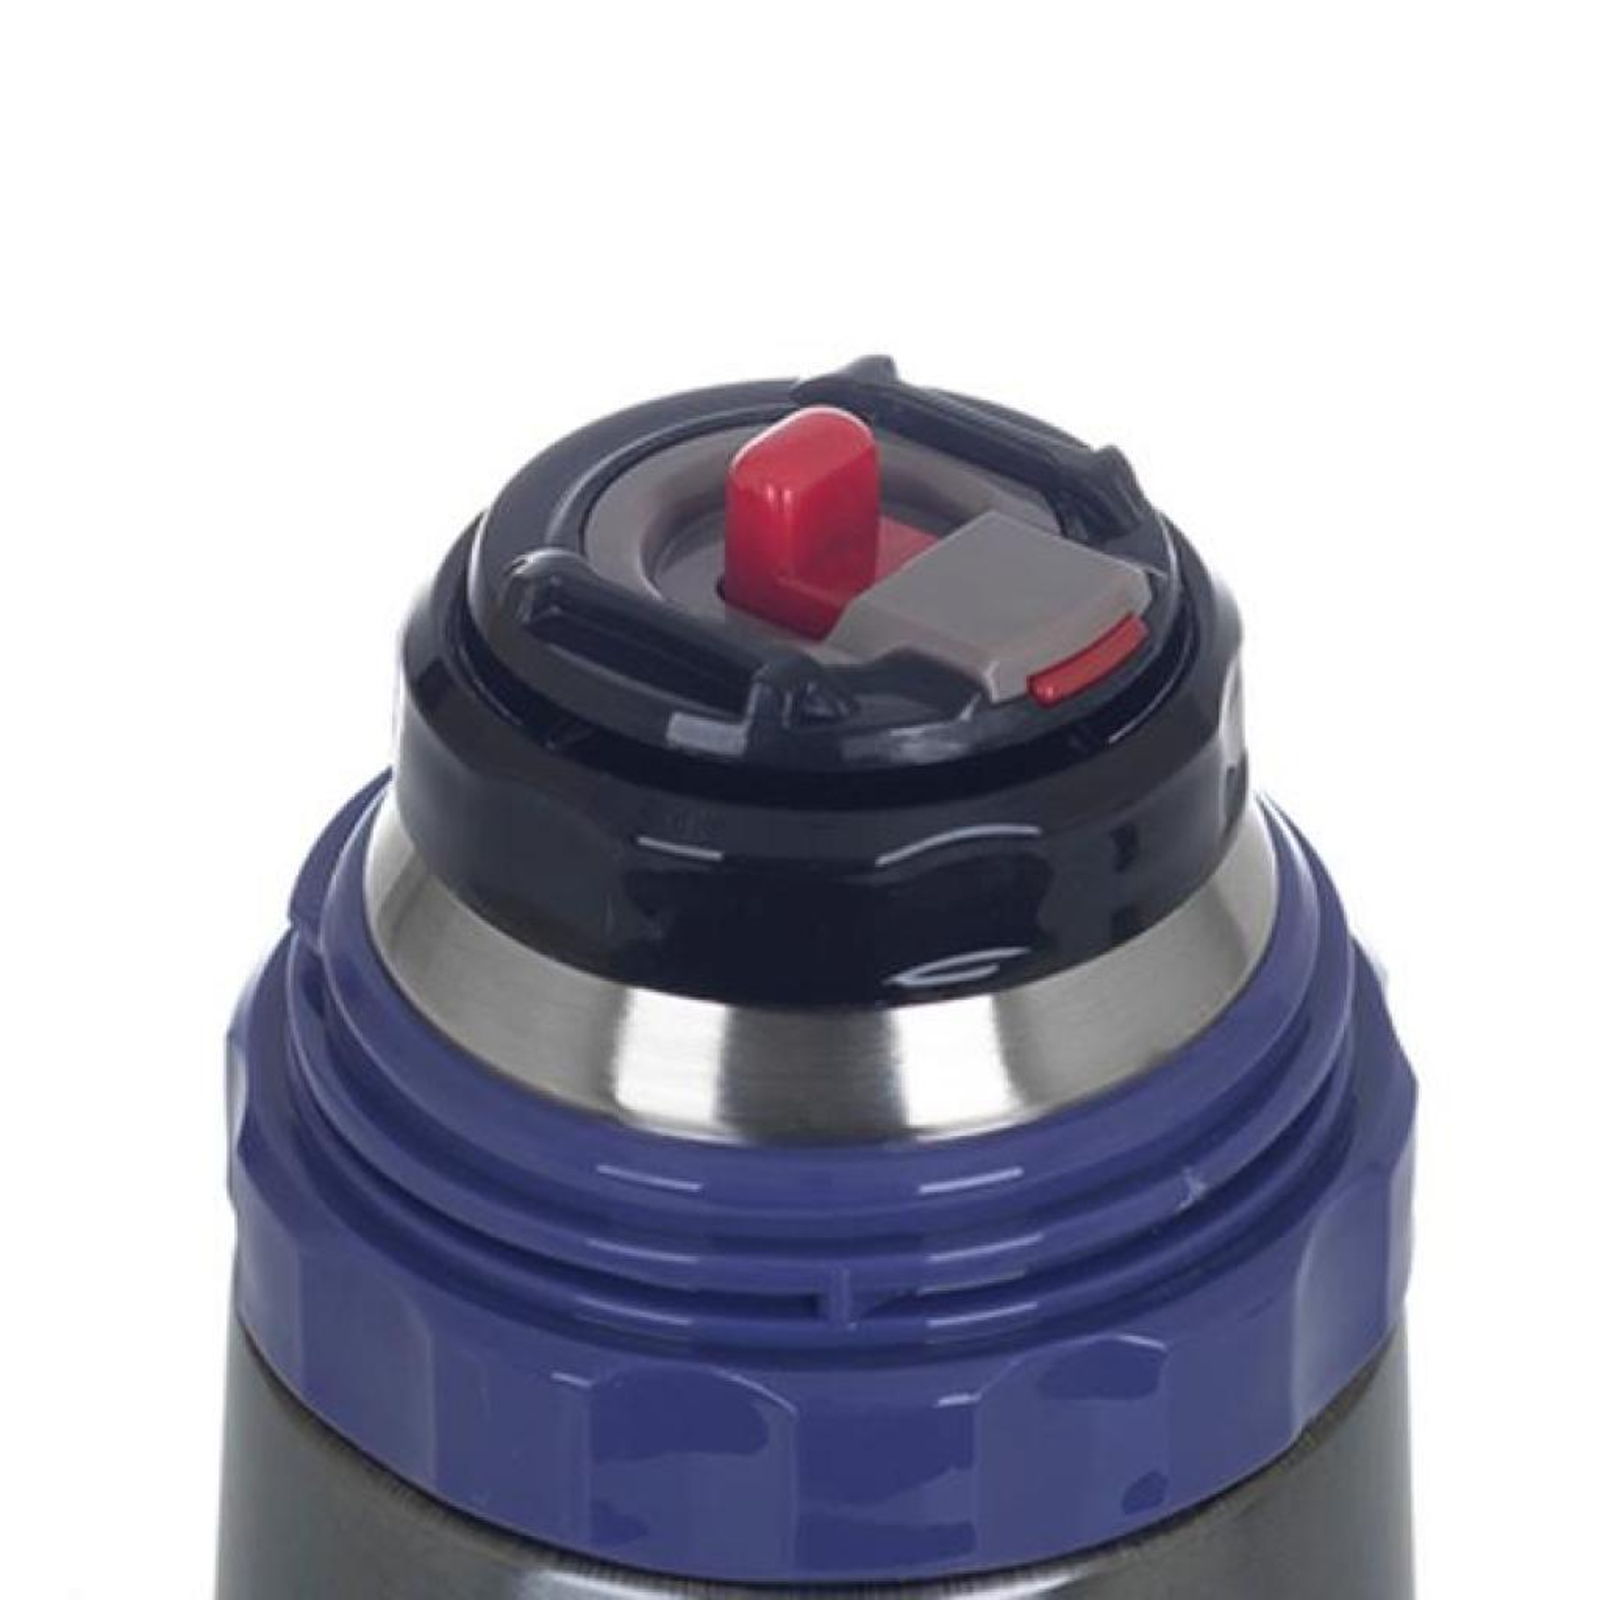 Термос Ringel Solo 0.8 L Black (RG-6101-800/2) изображение 3